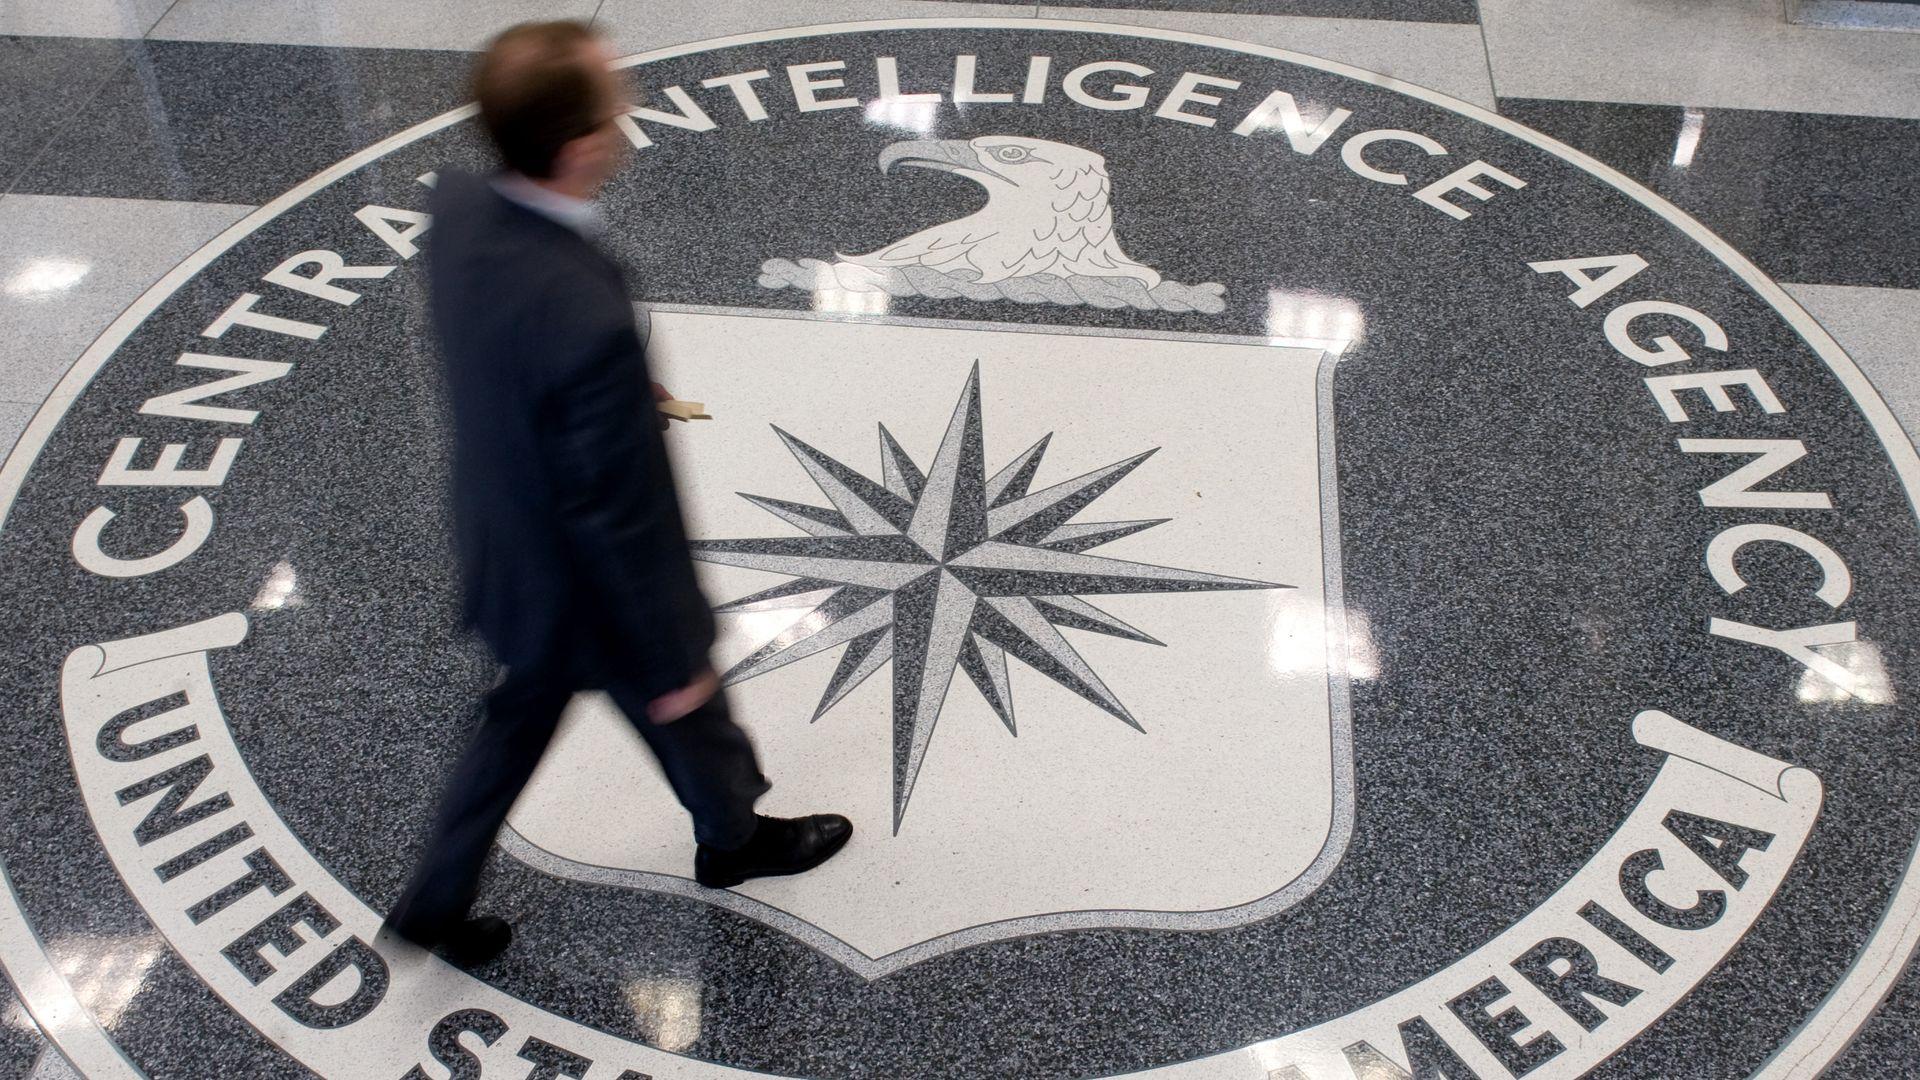 CIA headqurters